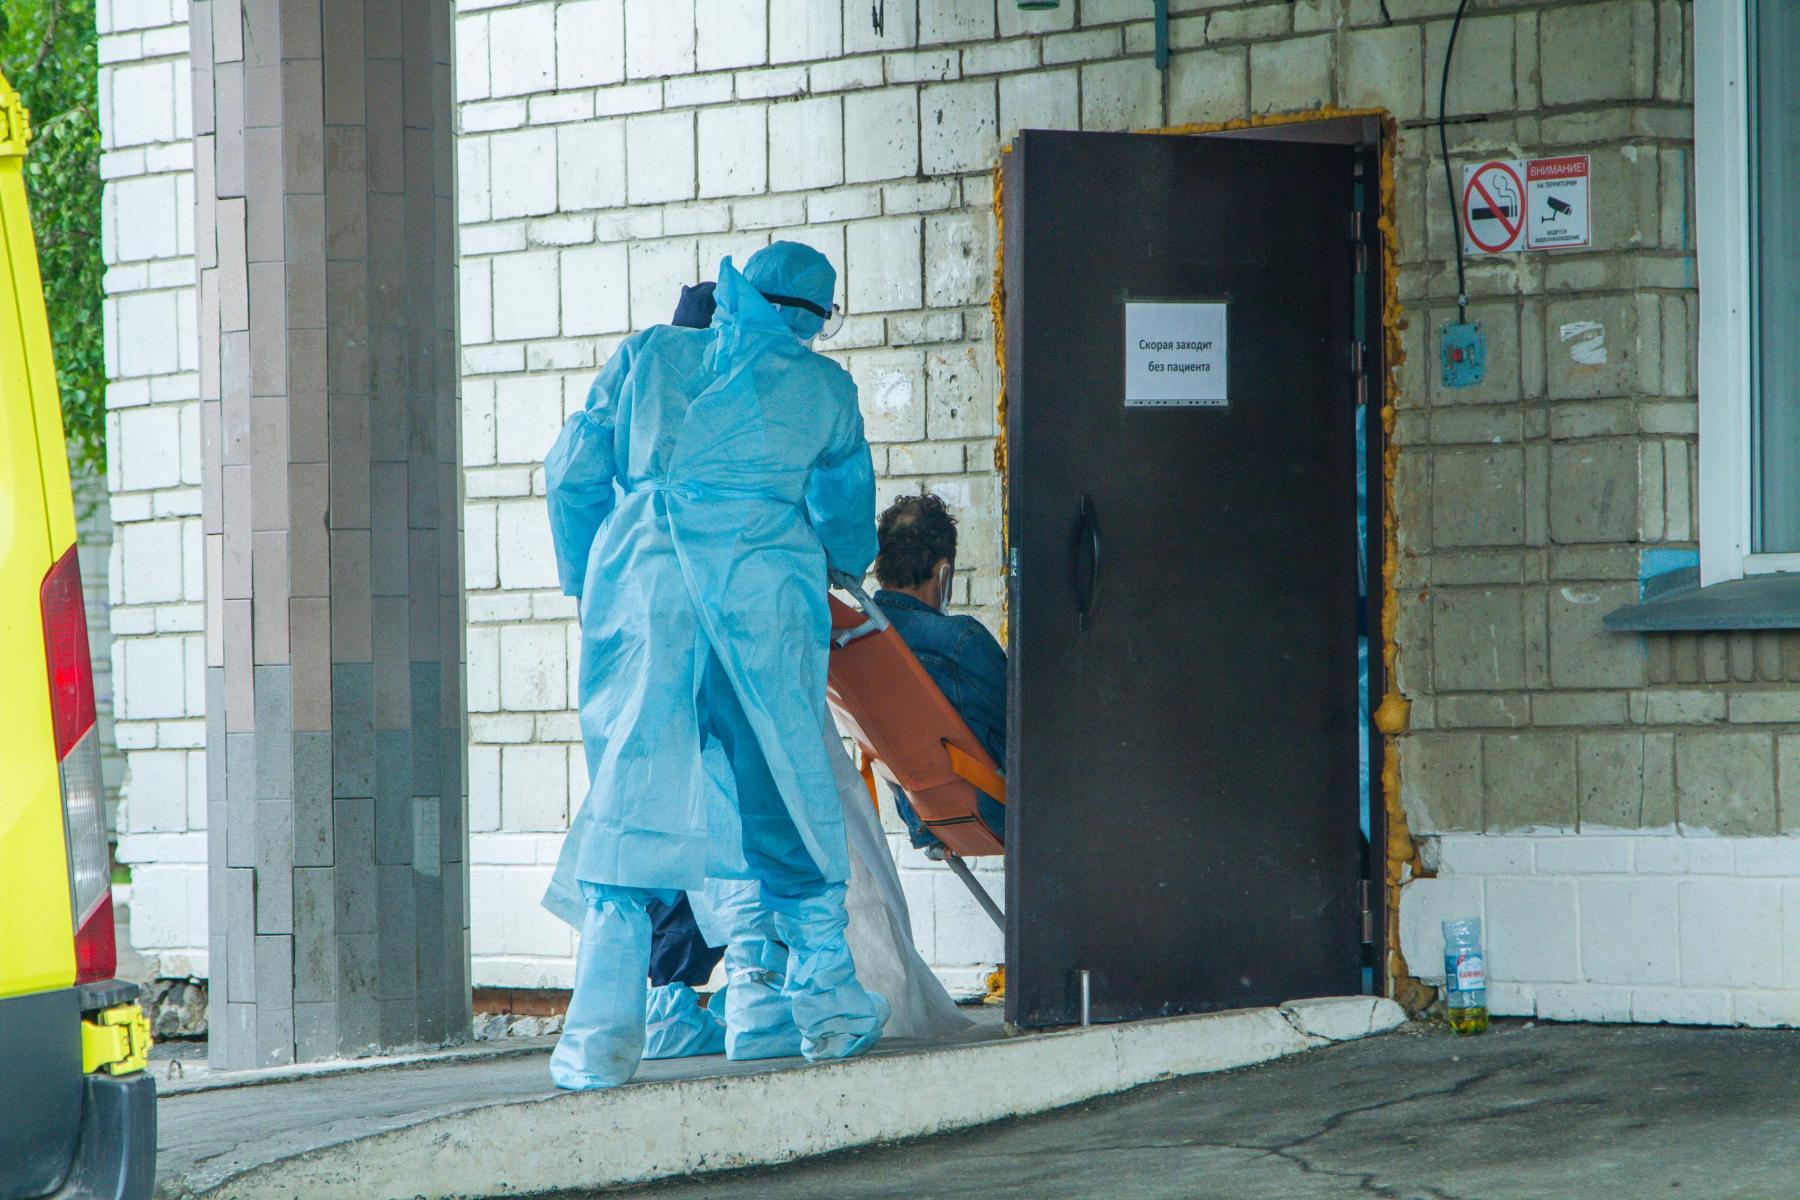 фото Коронавирус в Новосибирске: ситуация к 9 июня 3